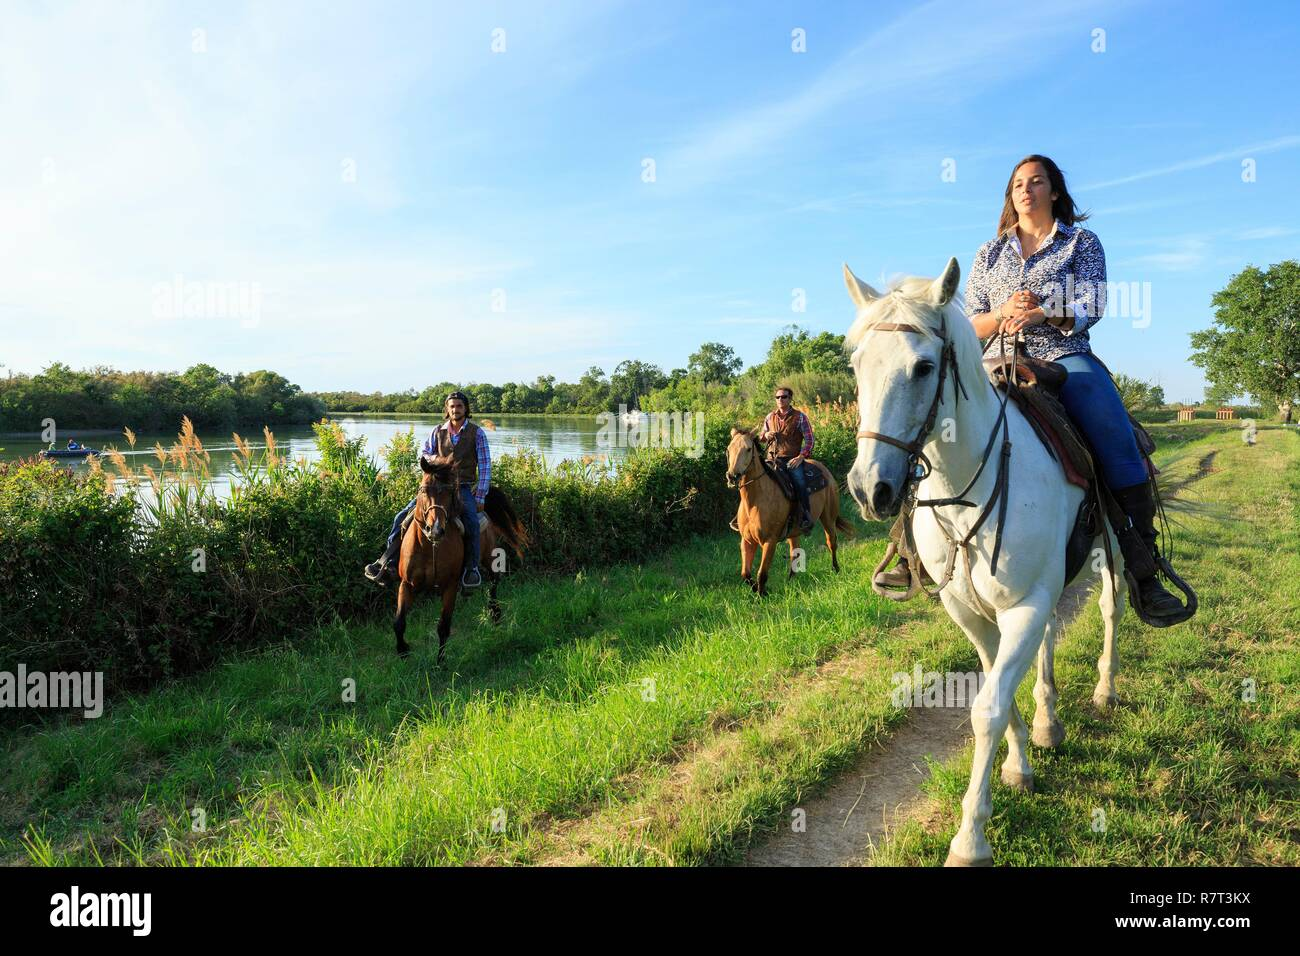 Francia, Bouches du Rhône, Parque Natural Regional de Camarga, Les Saintes Maries de la Mer, La Cavale, paseos a caballo Foto de stock